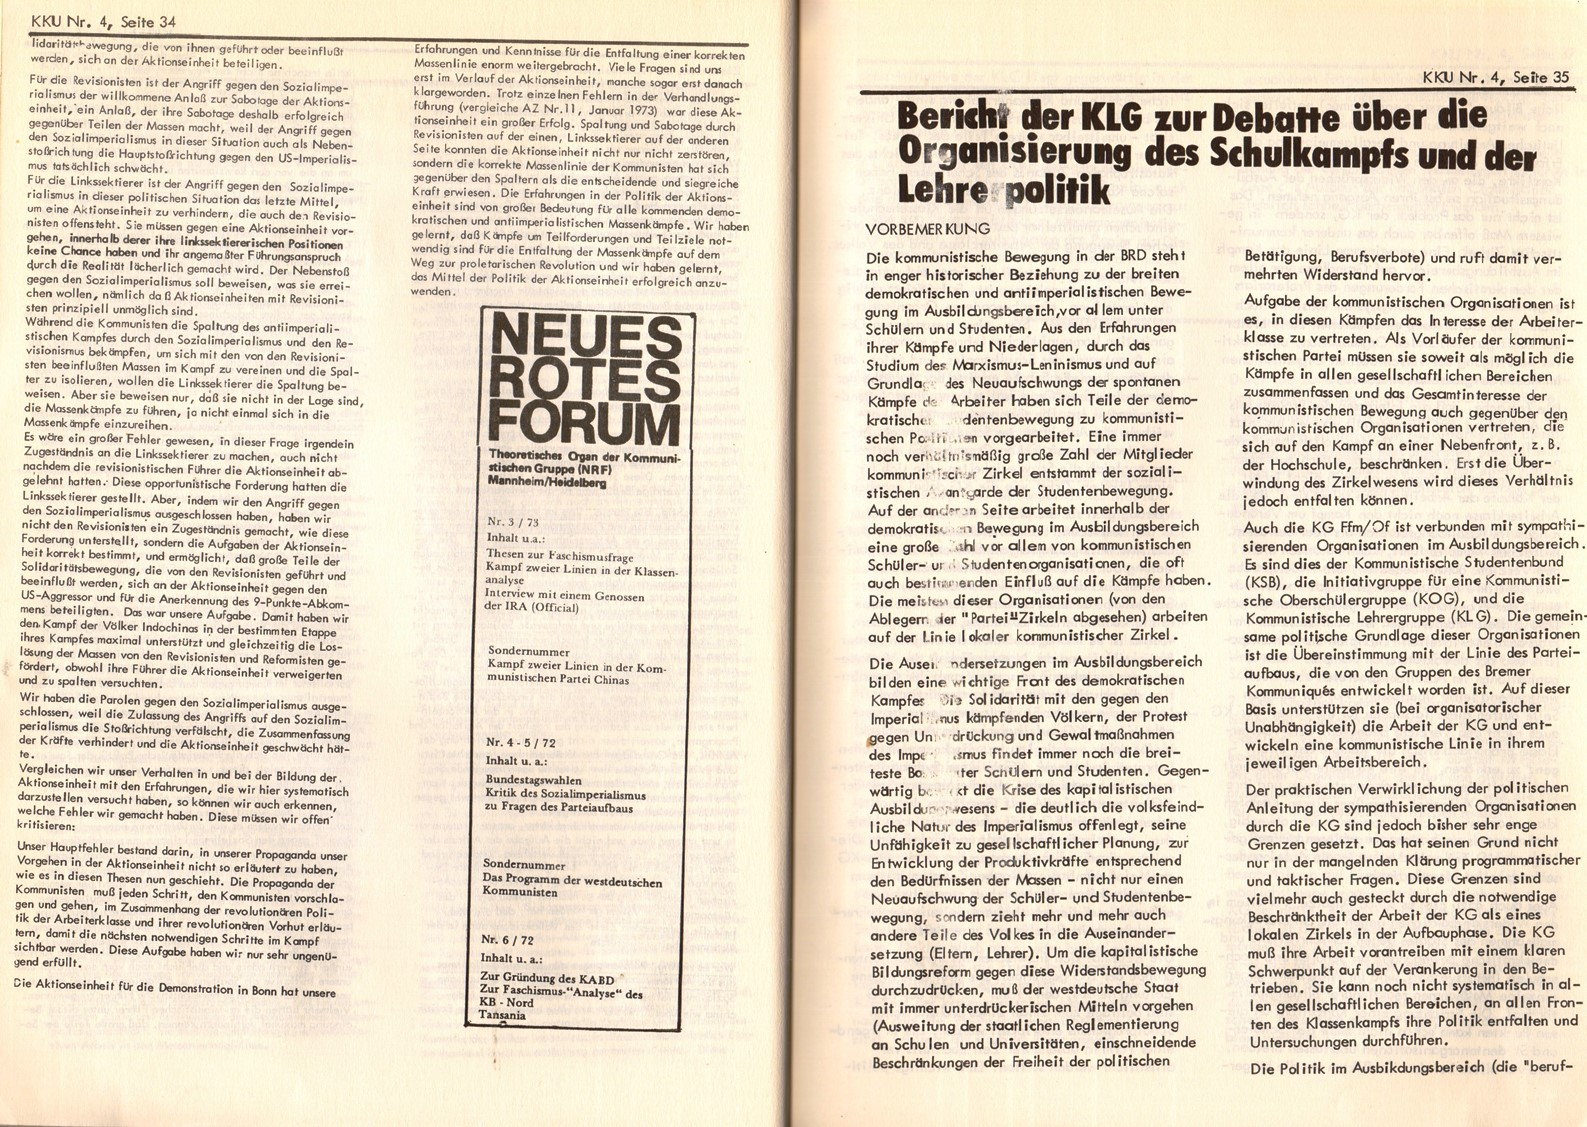 Frankfurt_Offenbach_KG_Kampf_Kritik_Umgestaltung_1973_04_05_18